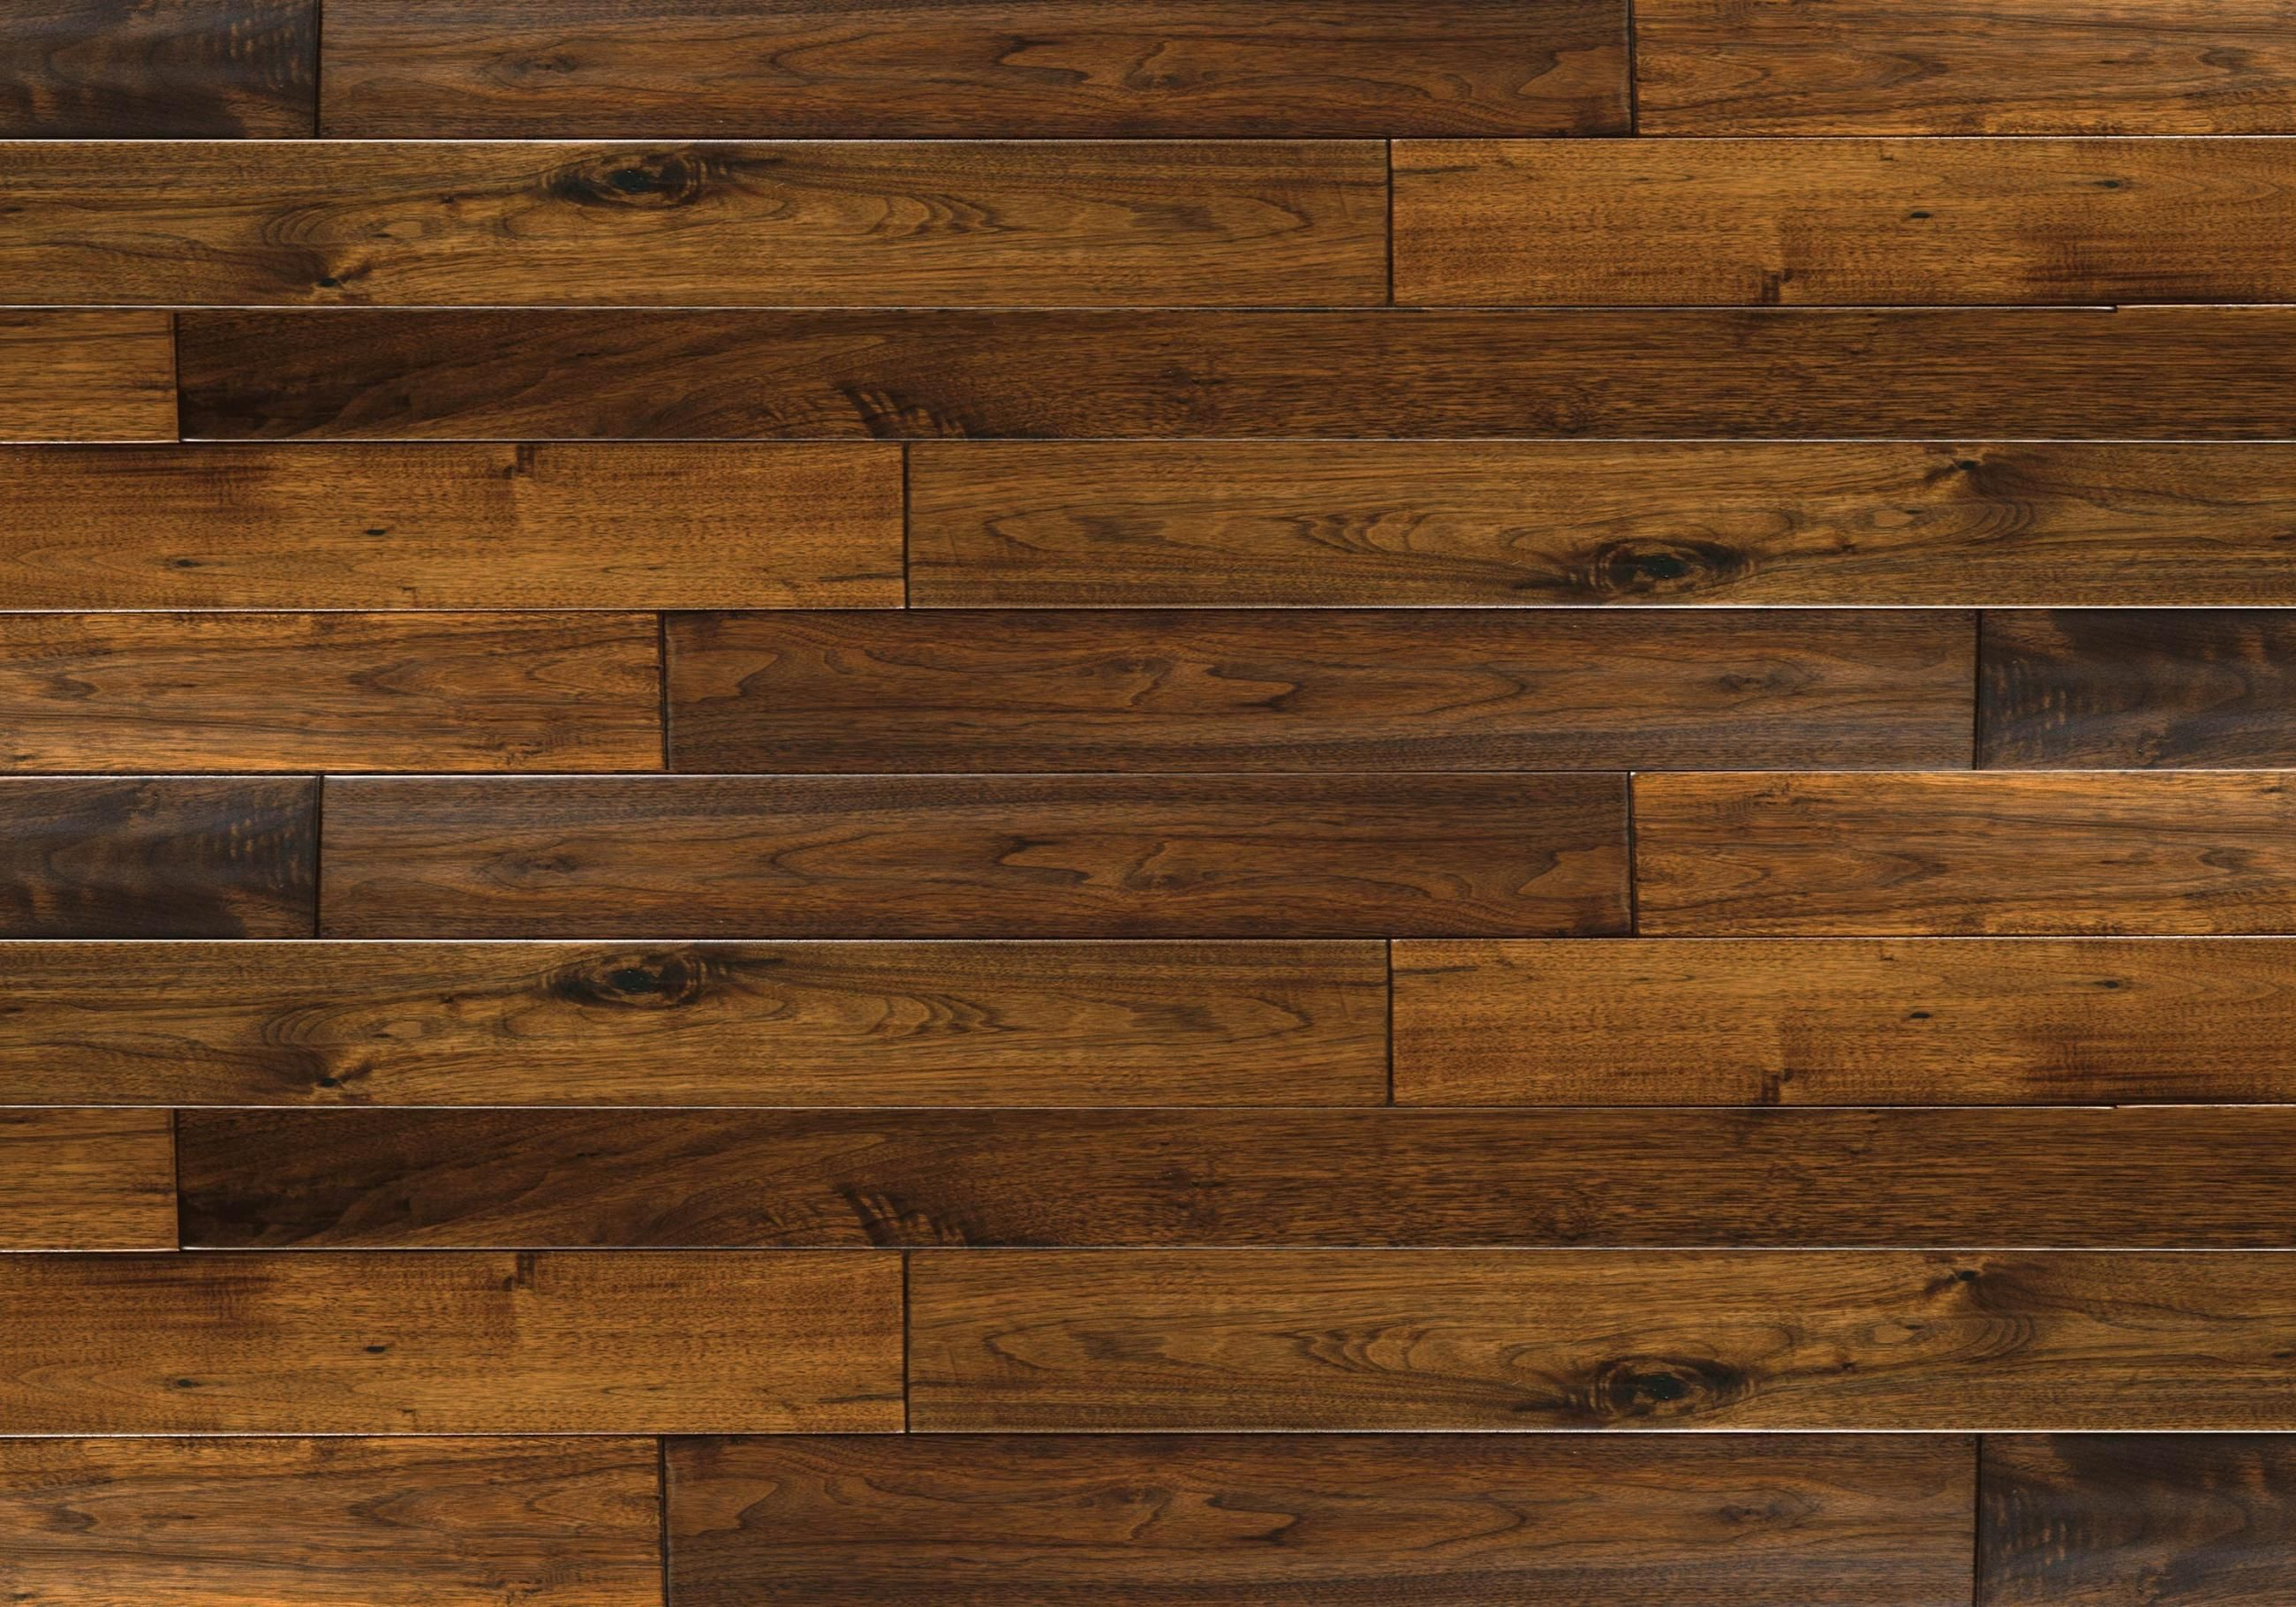 Walnut HFCentre Walnut wood texture, Rustic hardwood